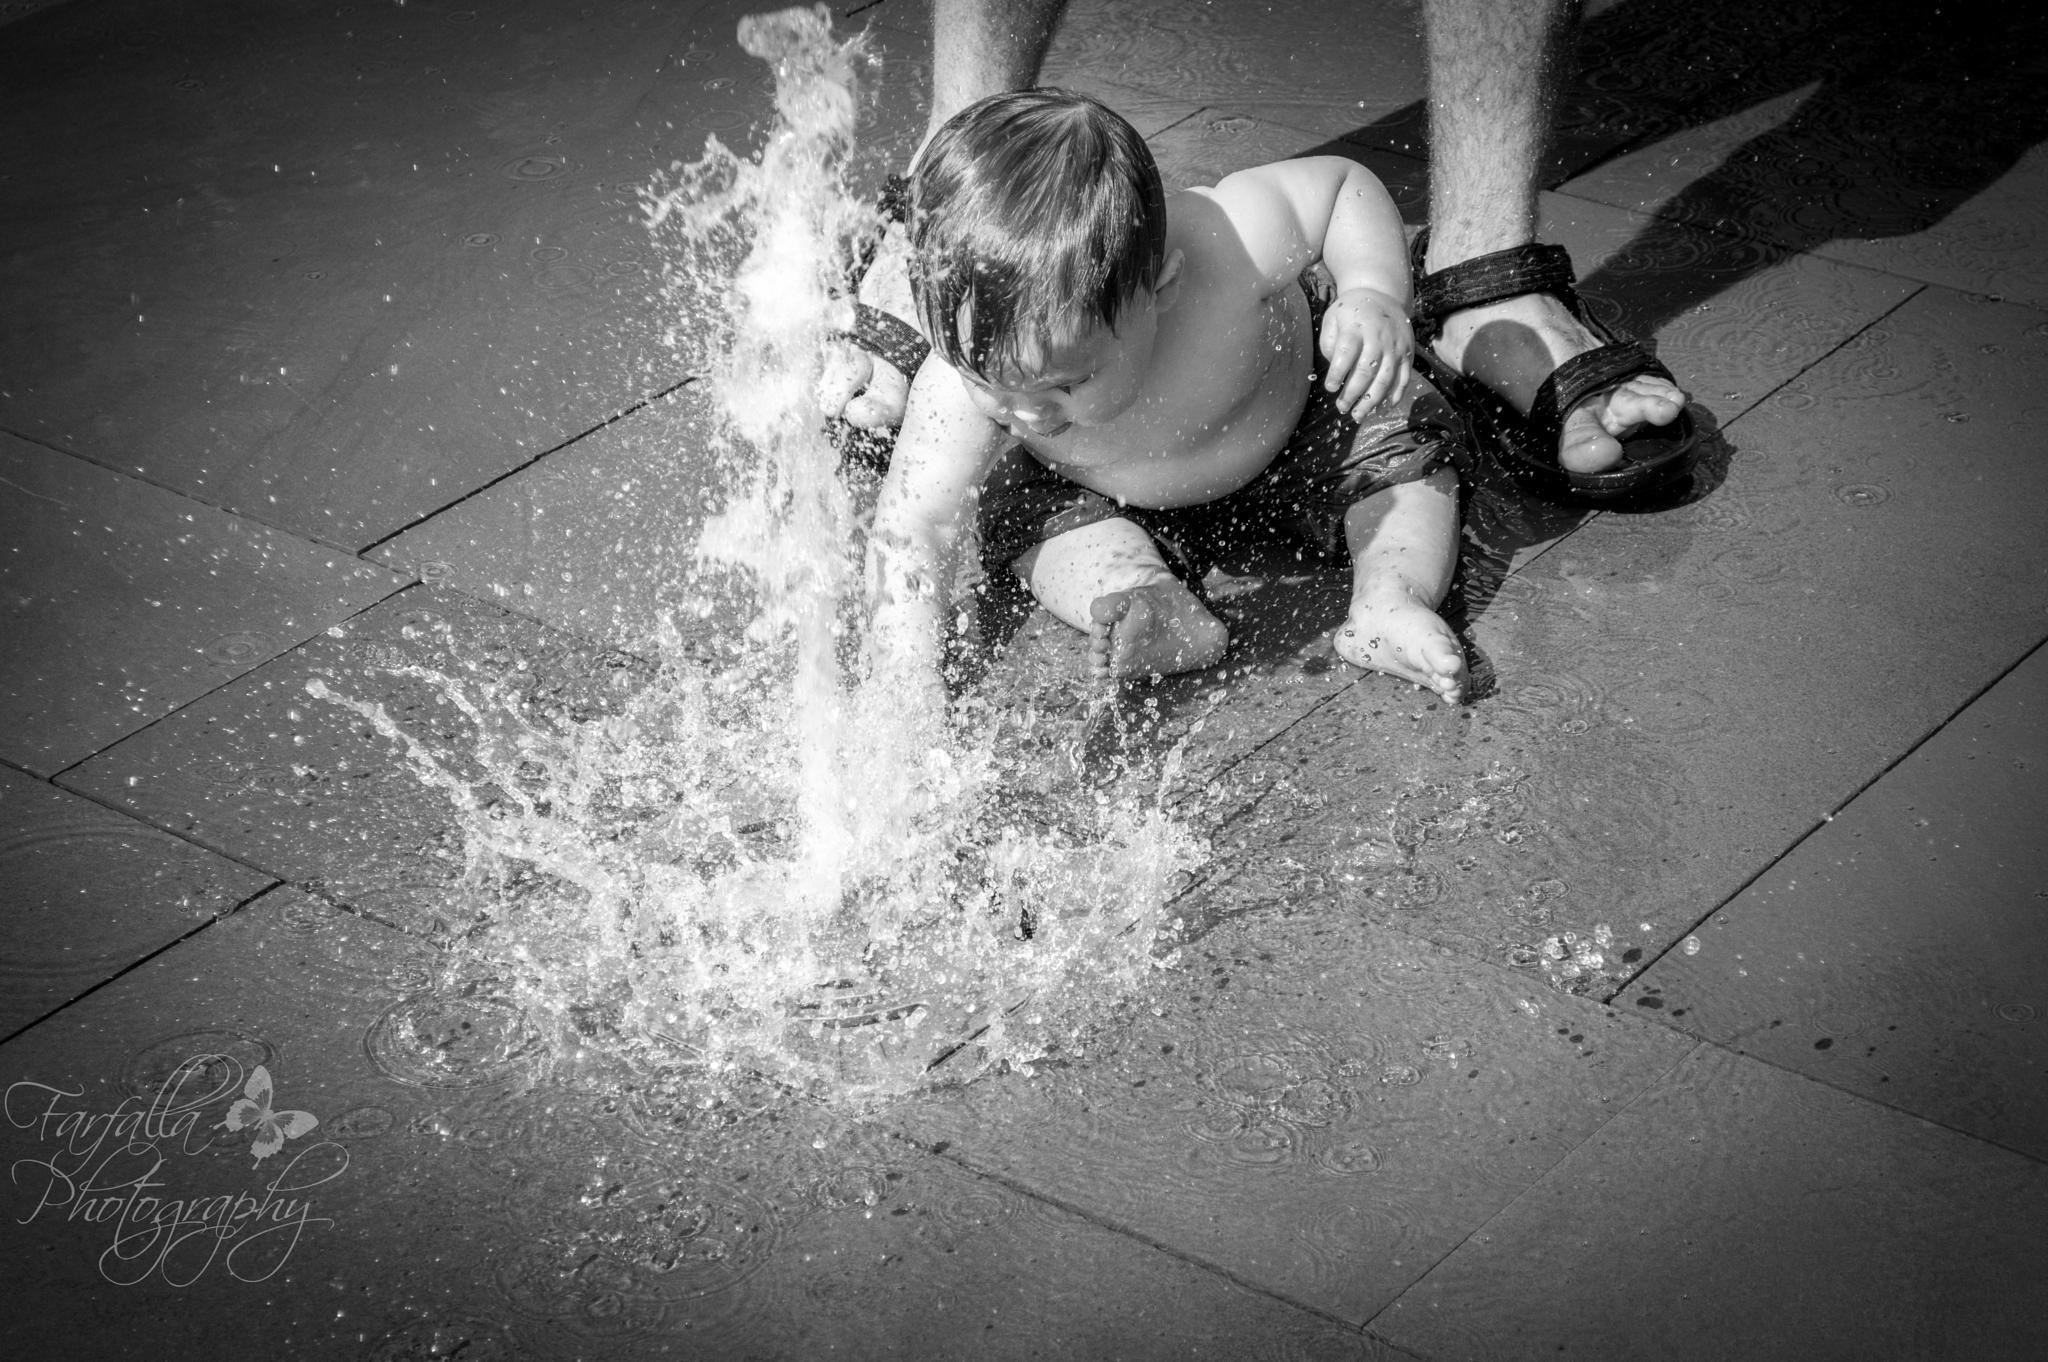 splish splash by M Knapp-Greiwe